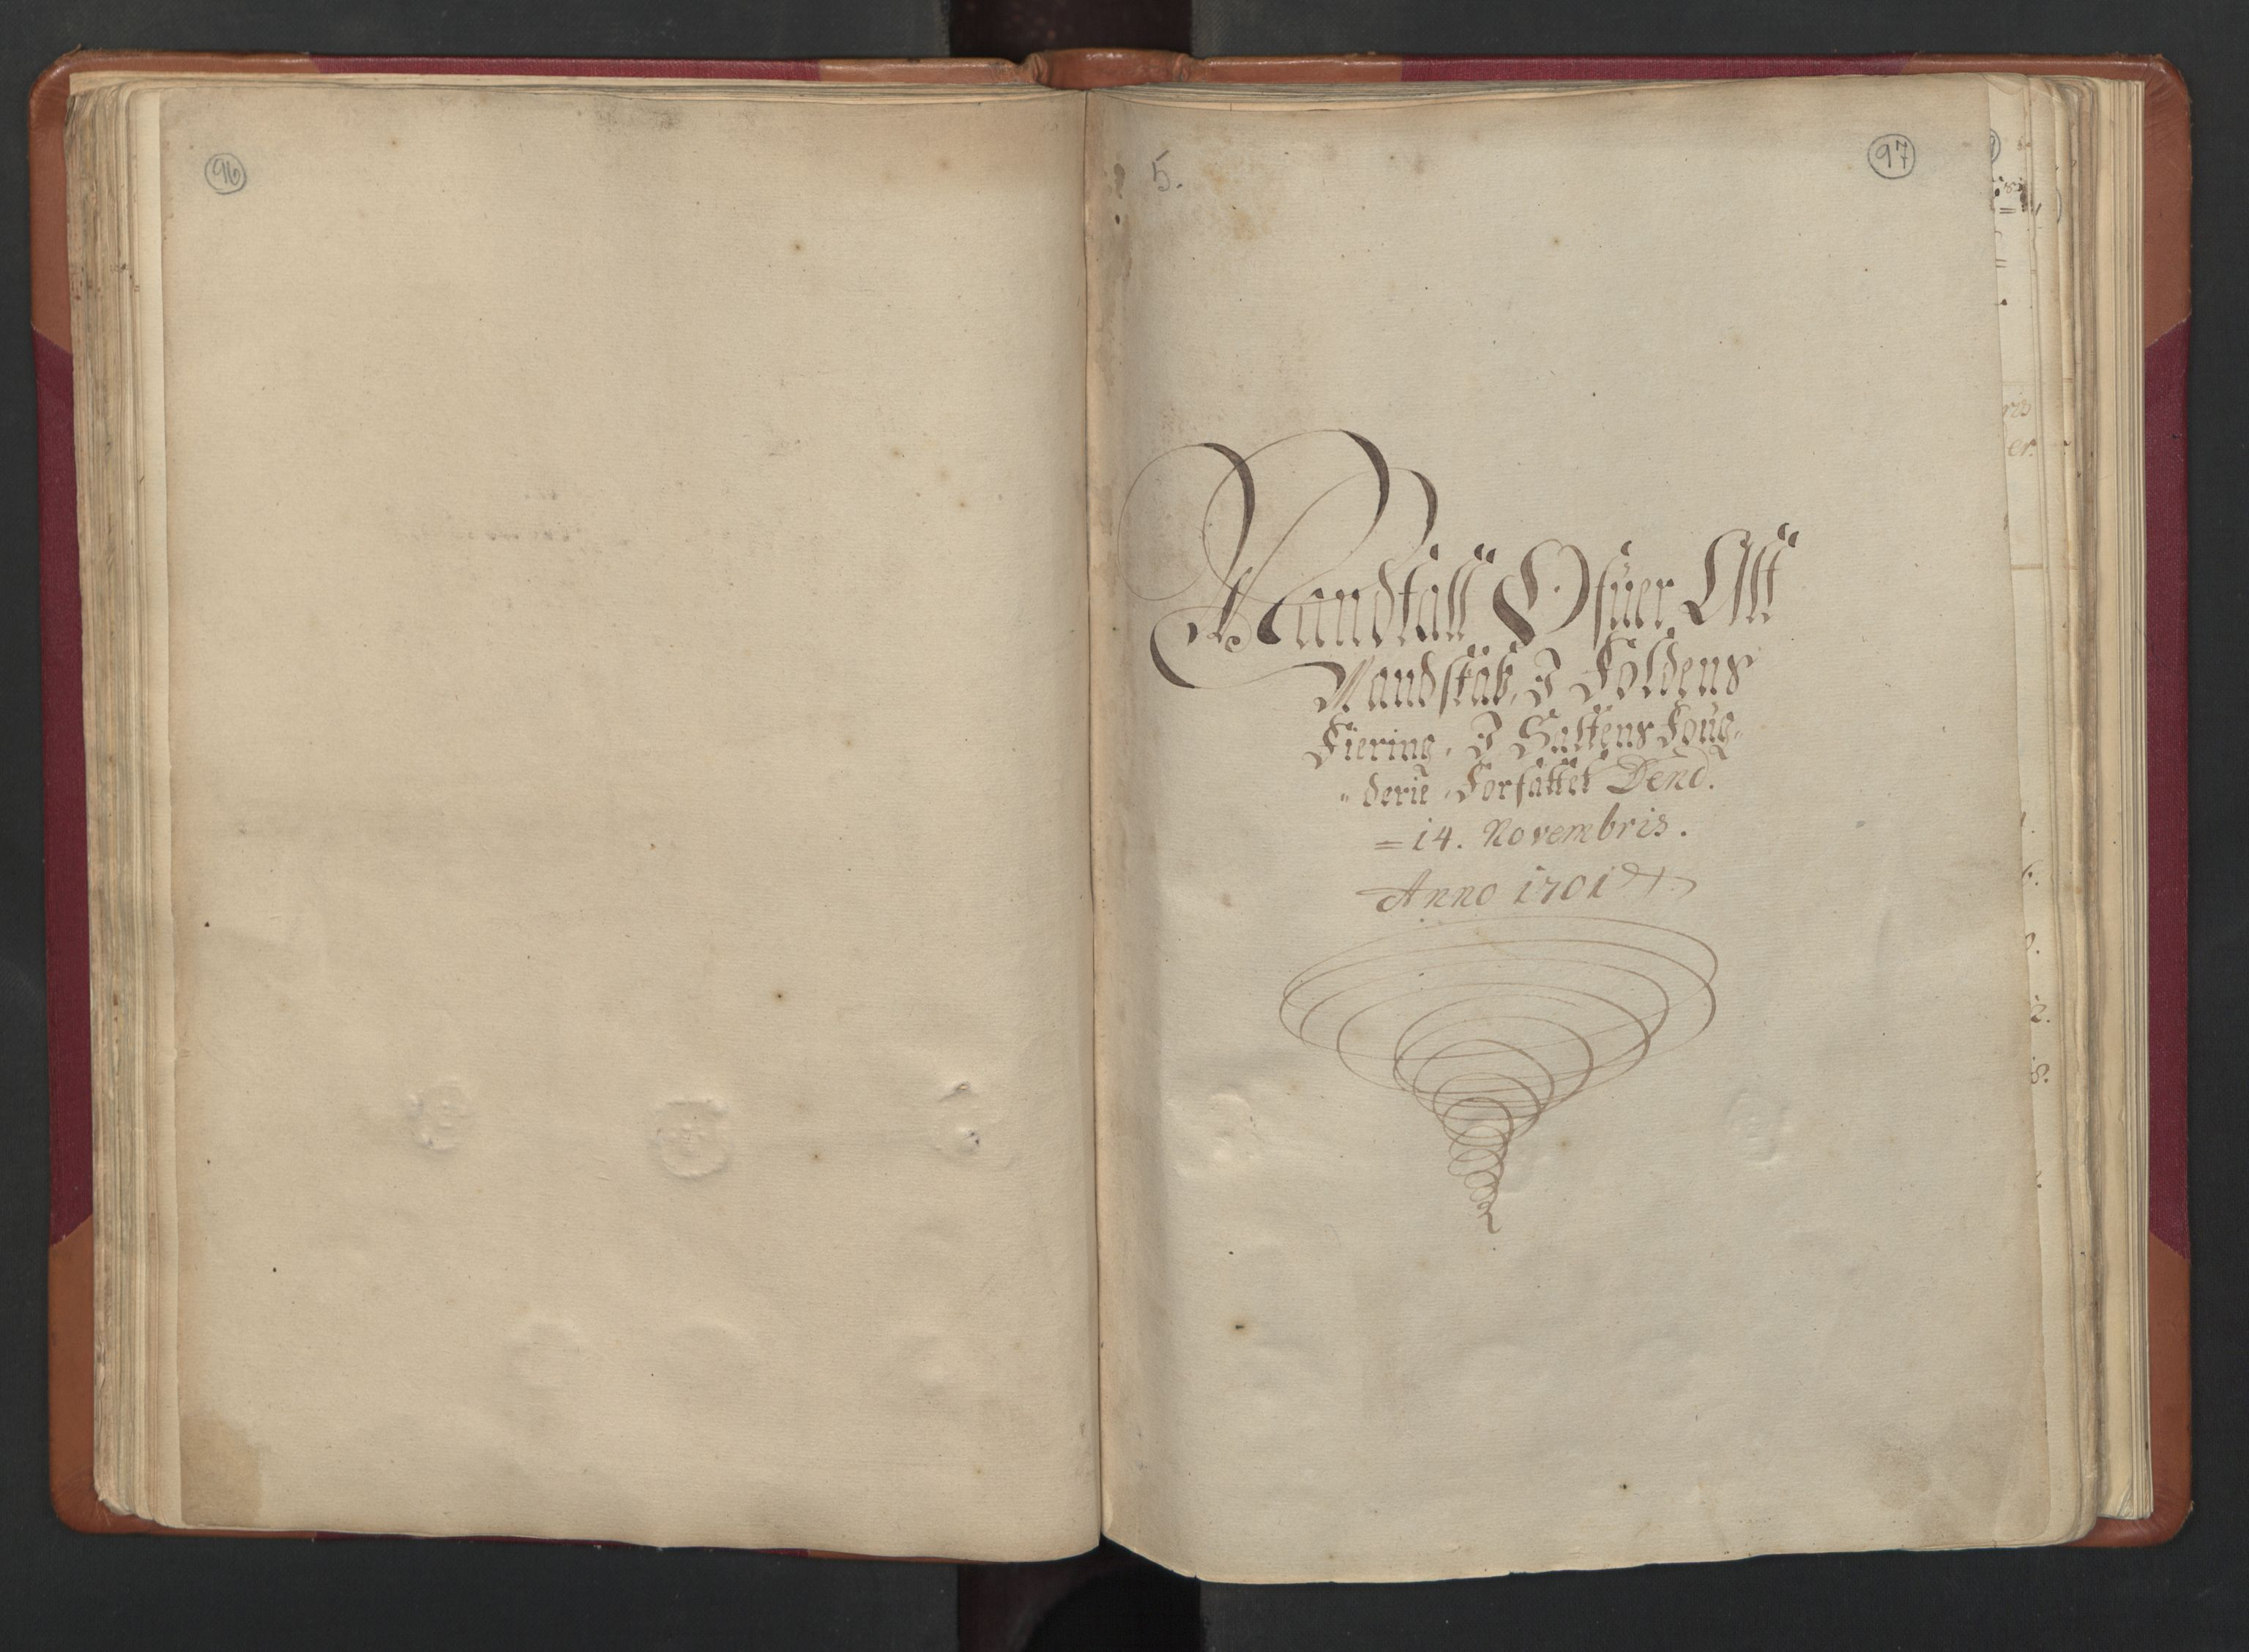 RA, Manntallet 1701, nr. 17: Salten fogderi, 1701, s. 96-97